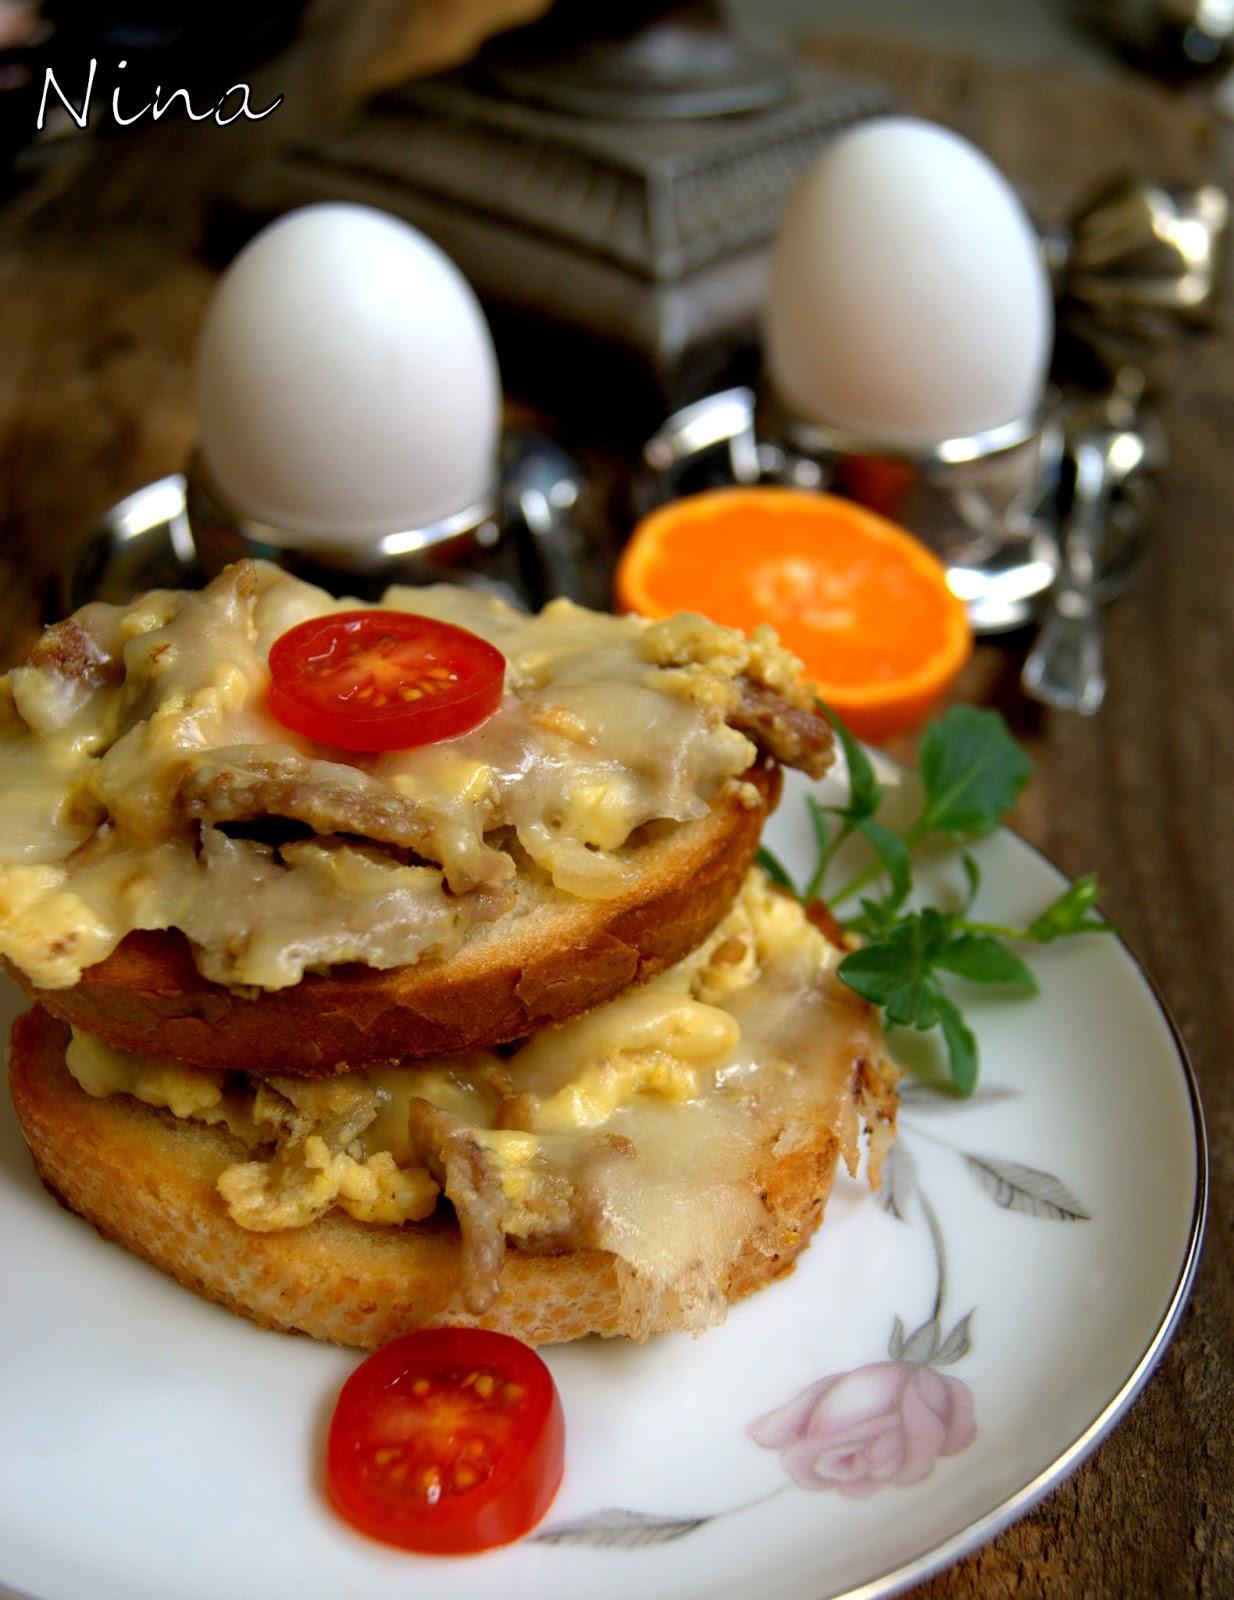 Old fashioned breakfast sausage recipe 44